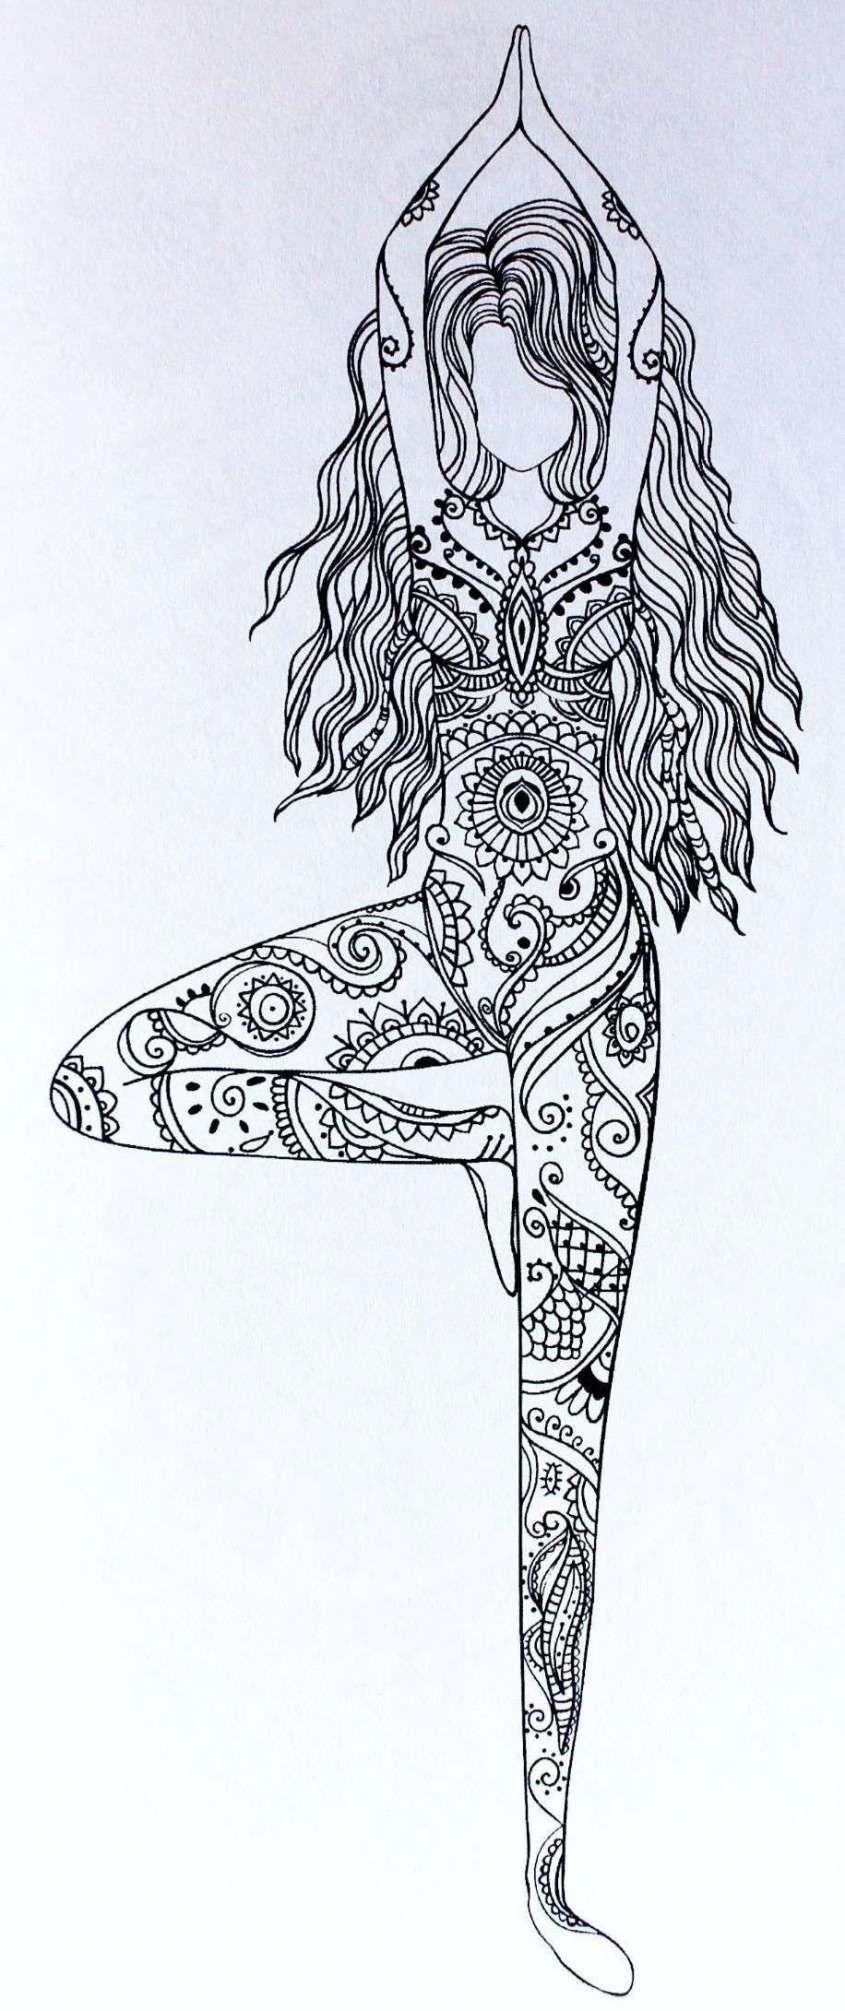 Mandalas para colorear: Dibujos para descargar gratis - Mandala ...